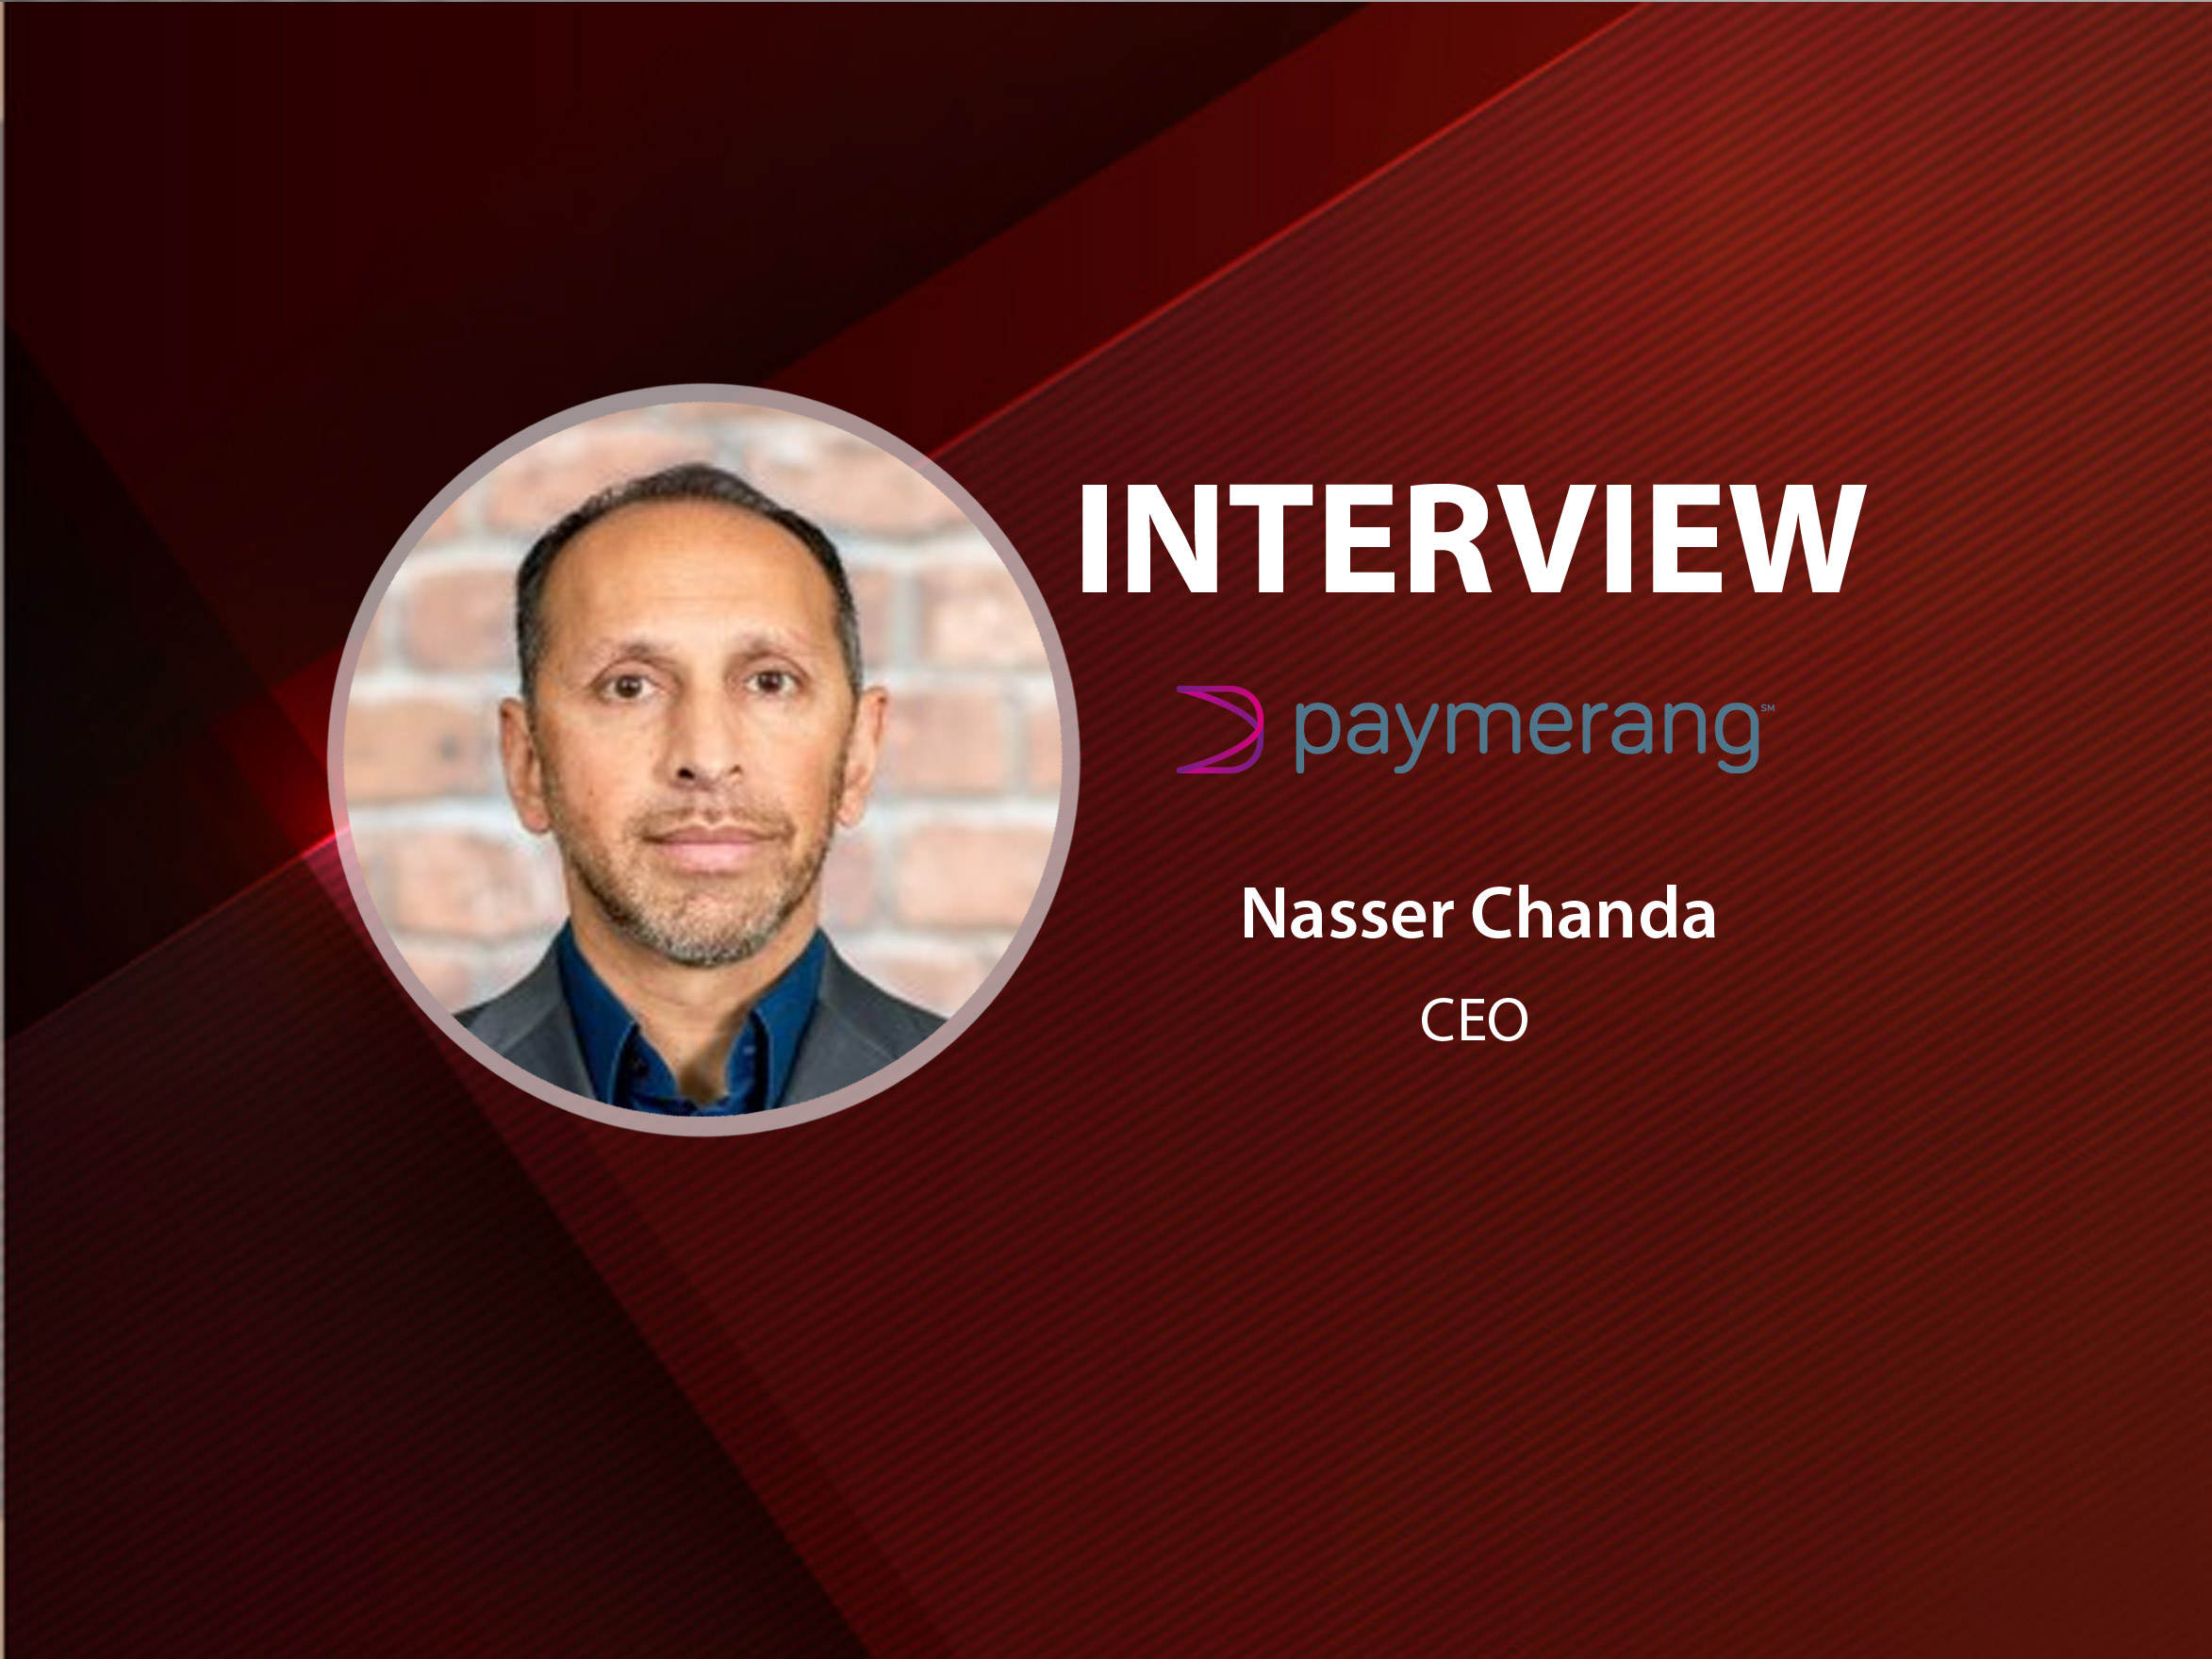 GlobalFintechSeries Interview with Nasser Chanda, CEO at Paymerang